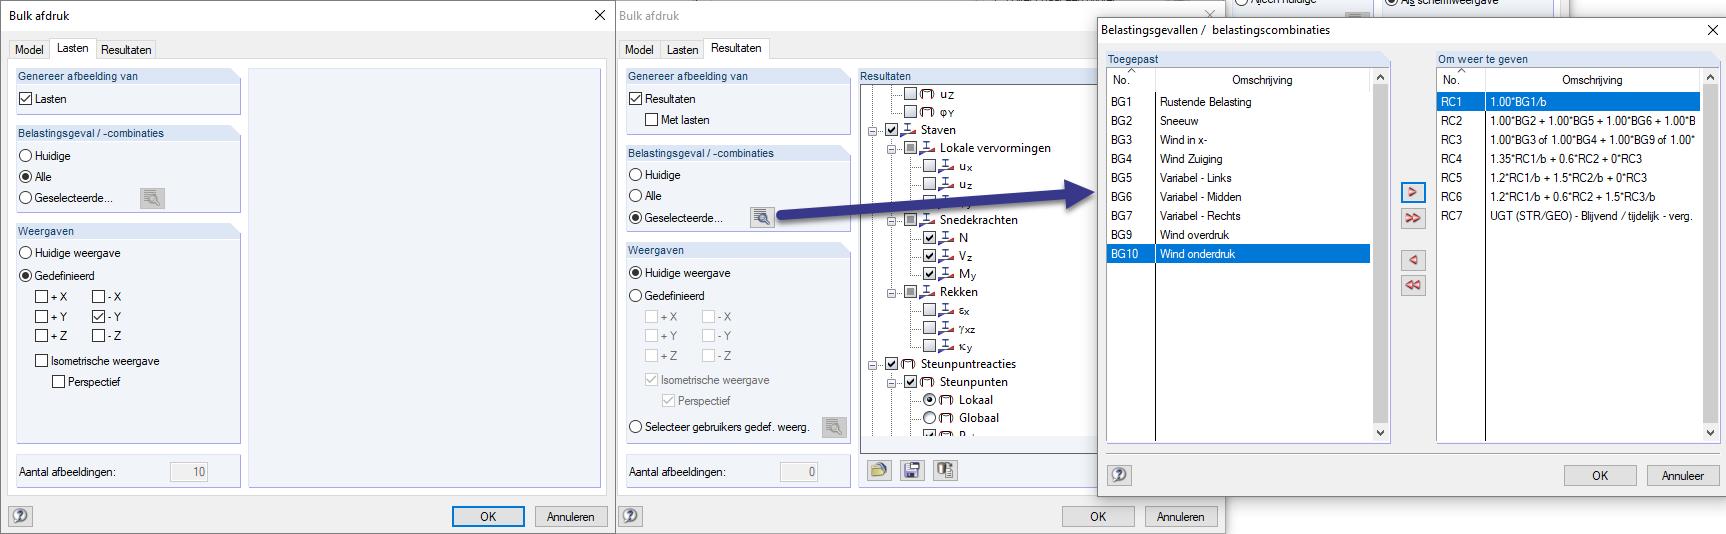 Plaatjes opmaken en toevoegen in berekeningsrapport in RFEM rekensoftware